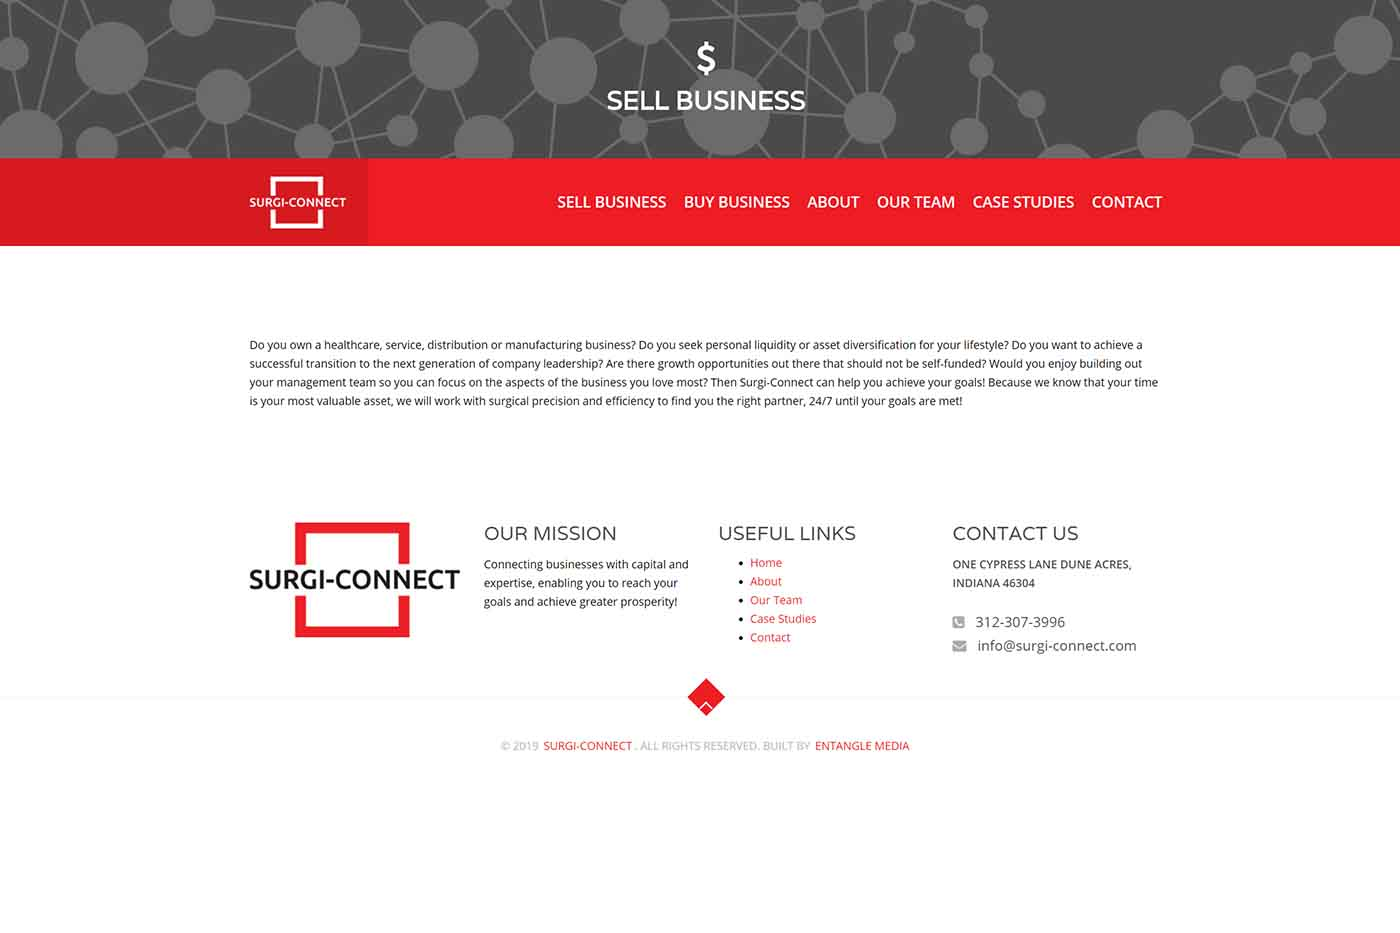 Surgi-Connect